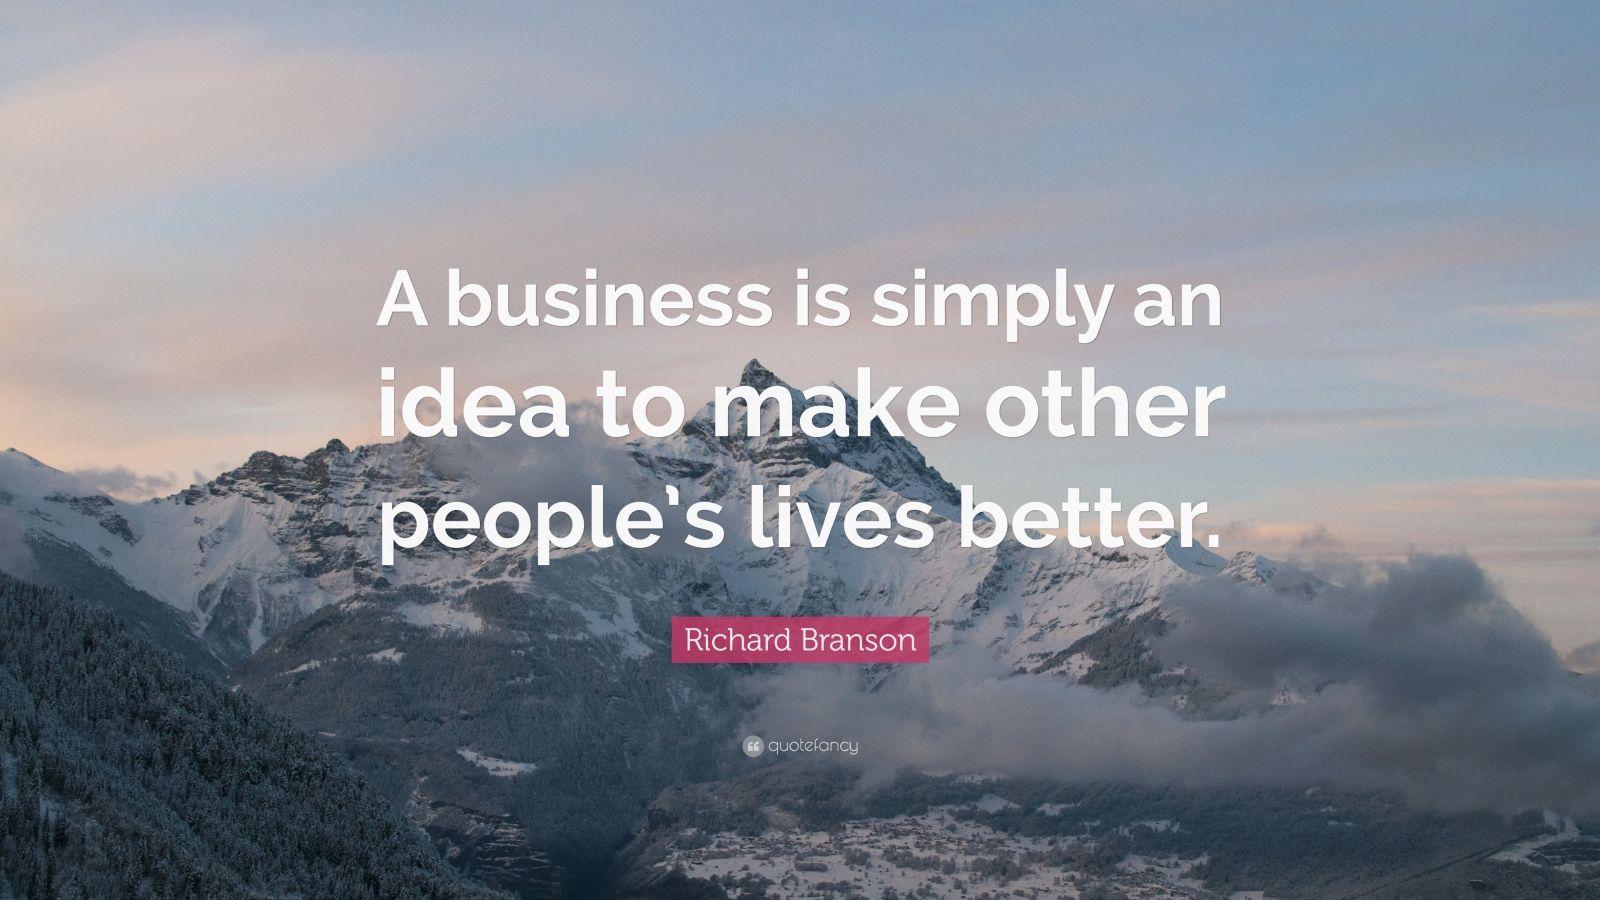 richard branson business quote Success